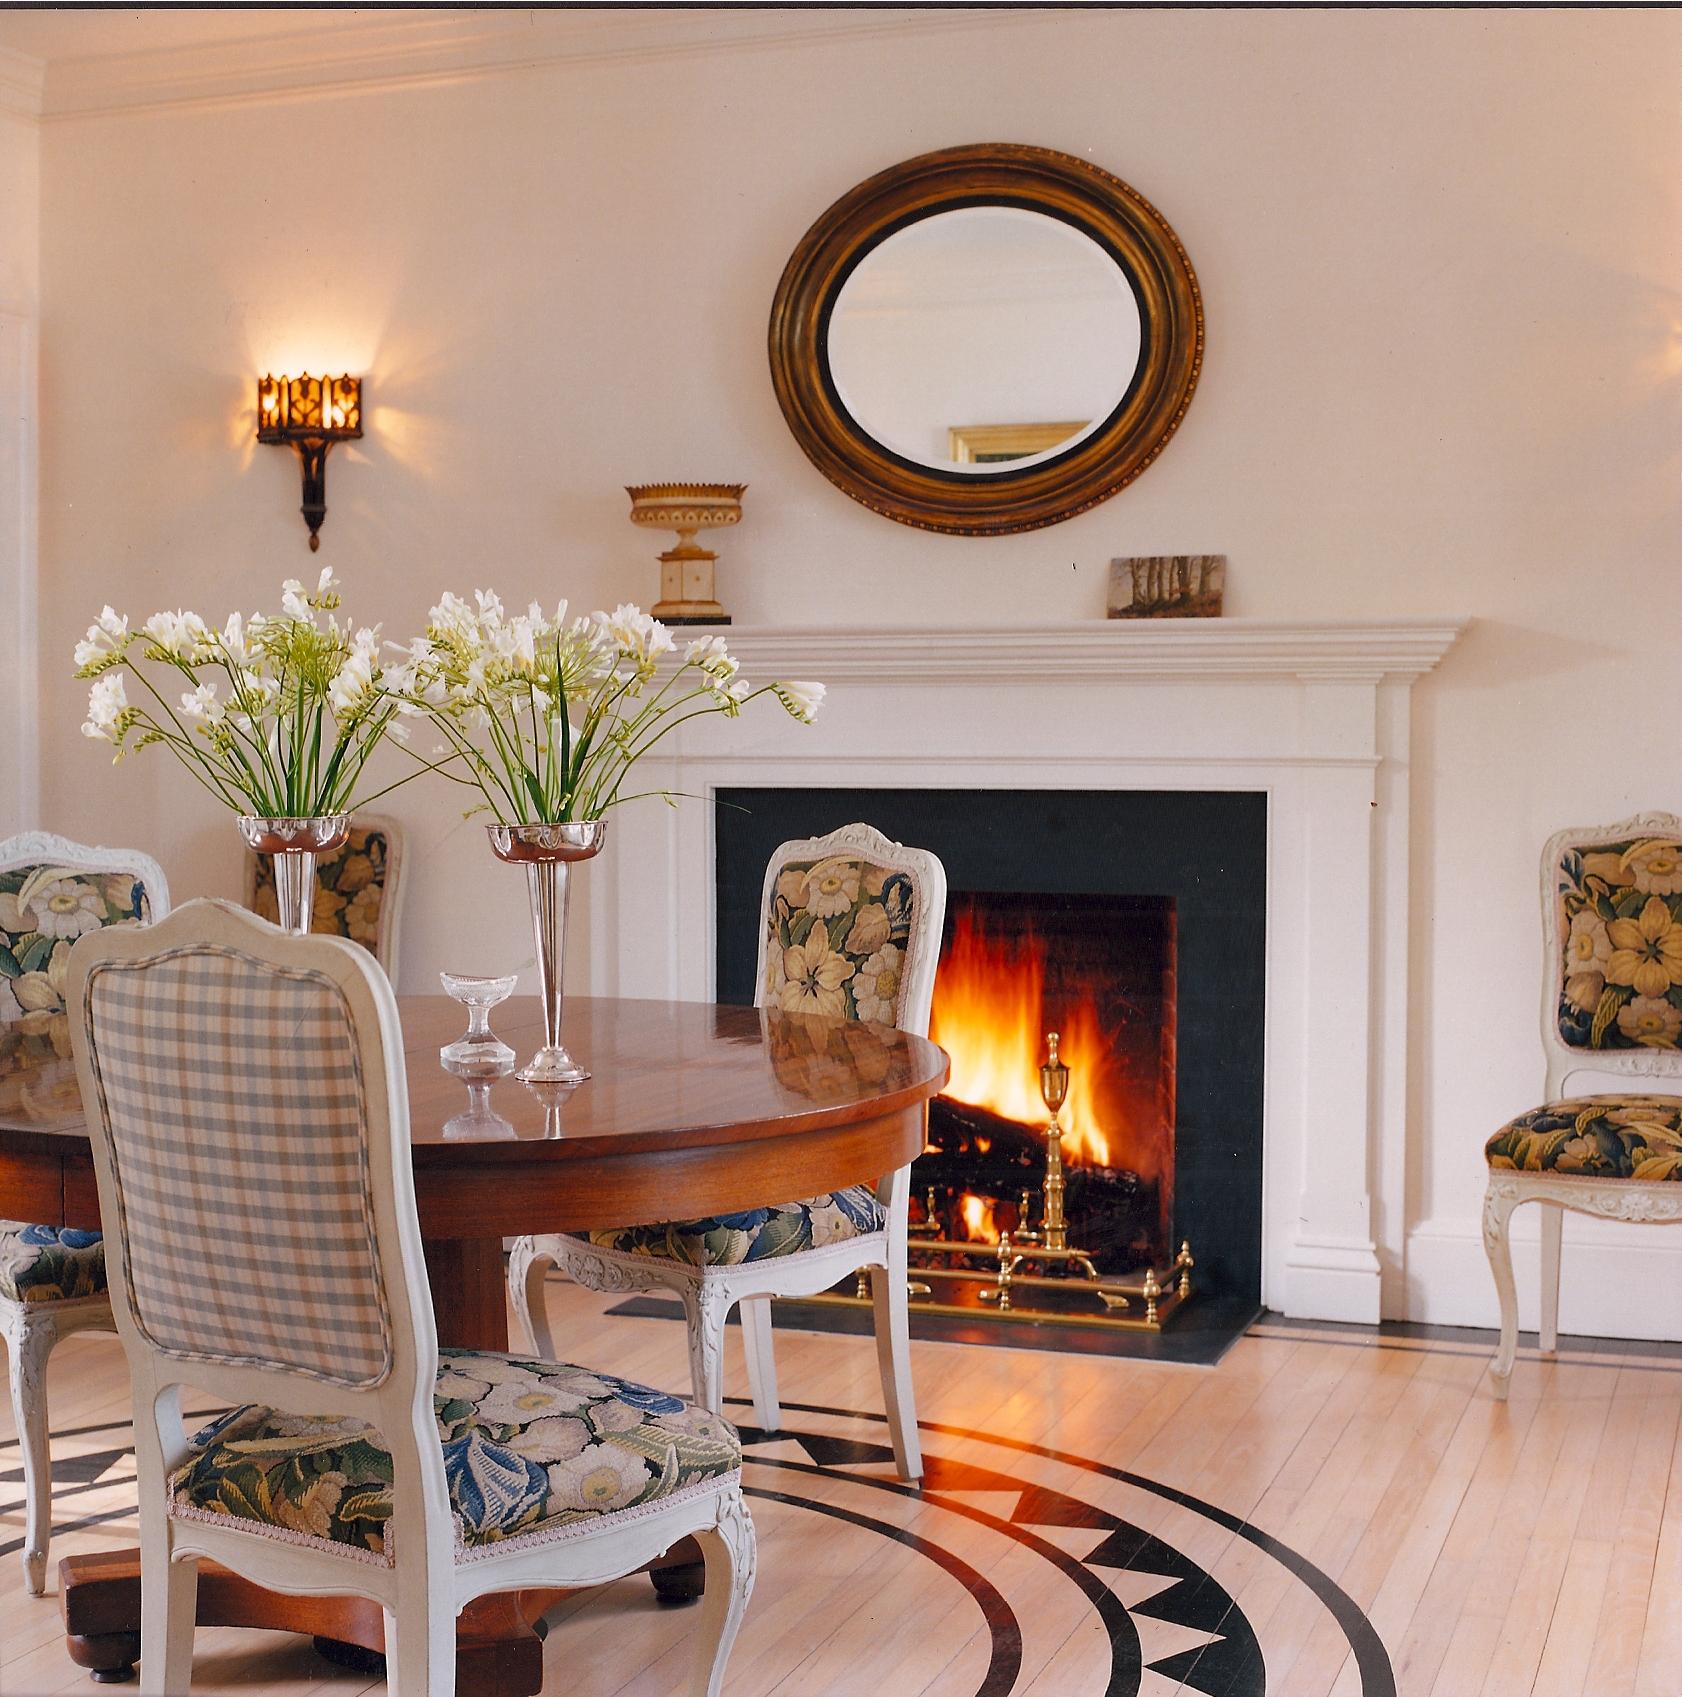 Interior design by Charles Spada Interiors